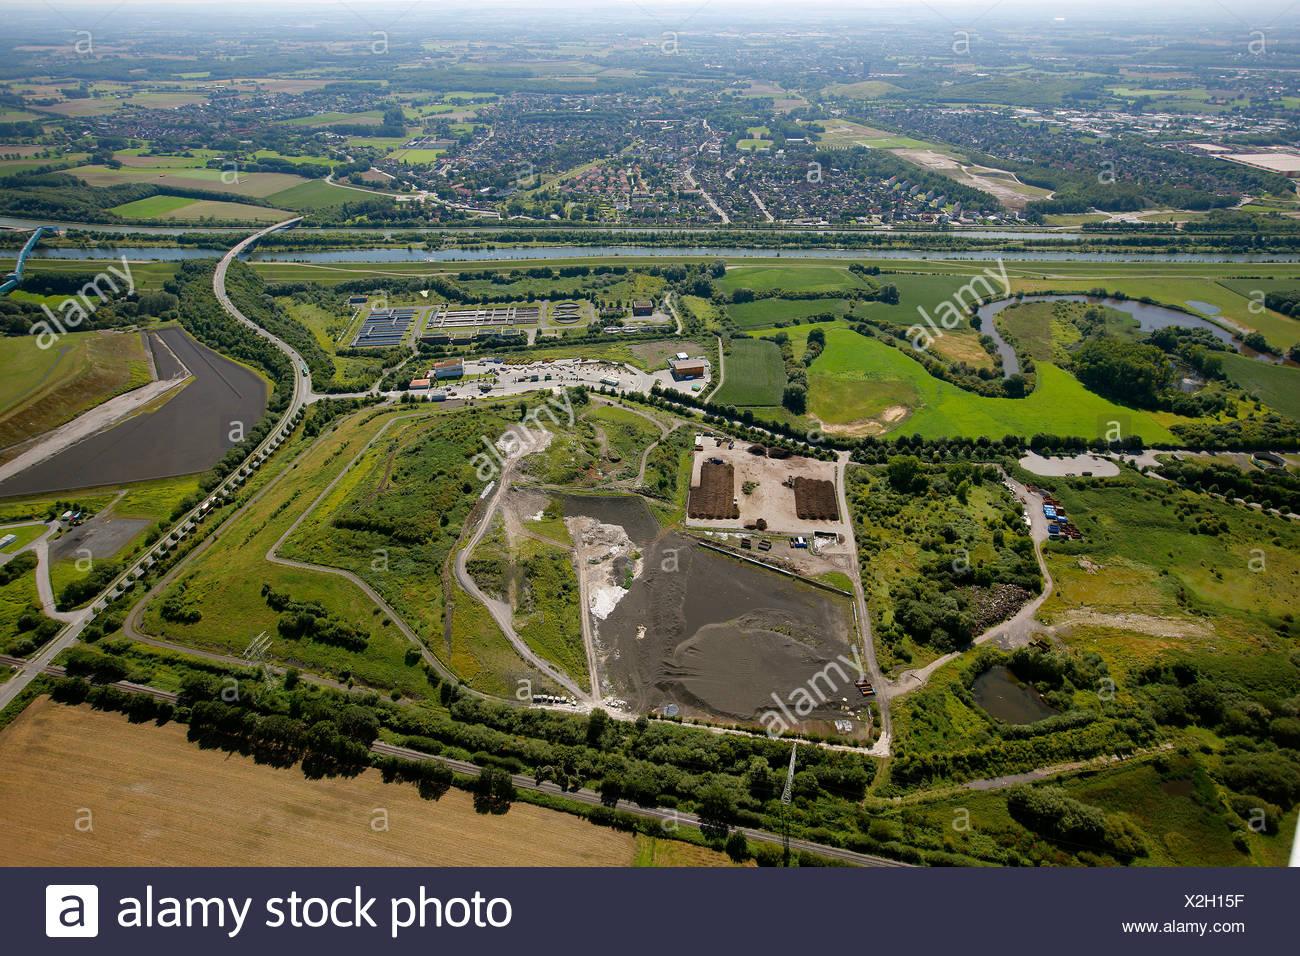 Aerial view, landfill, Hamm, Ruhr area, North Rhine-Westphalia, Germany, Europe - Stock Image